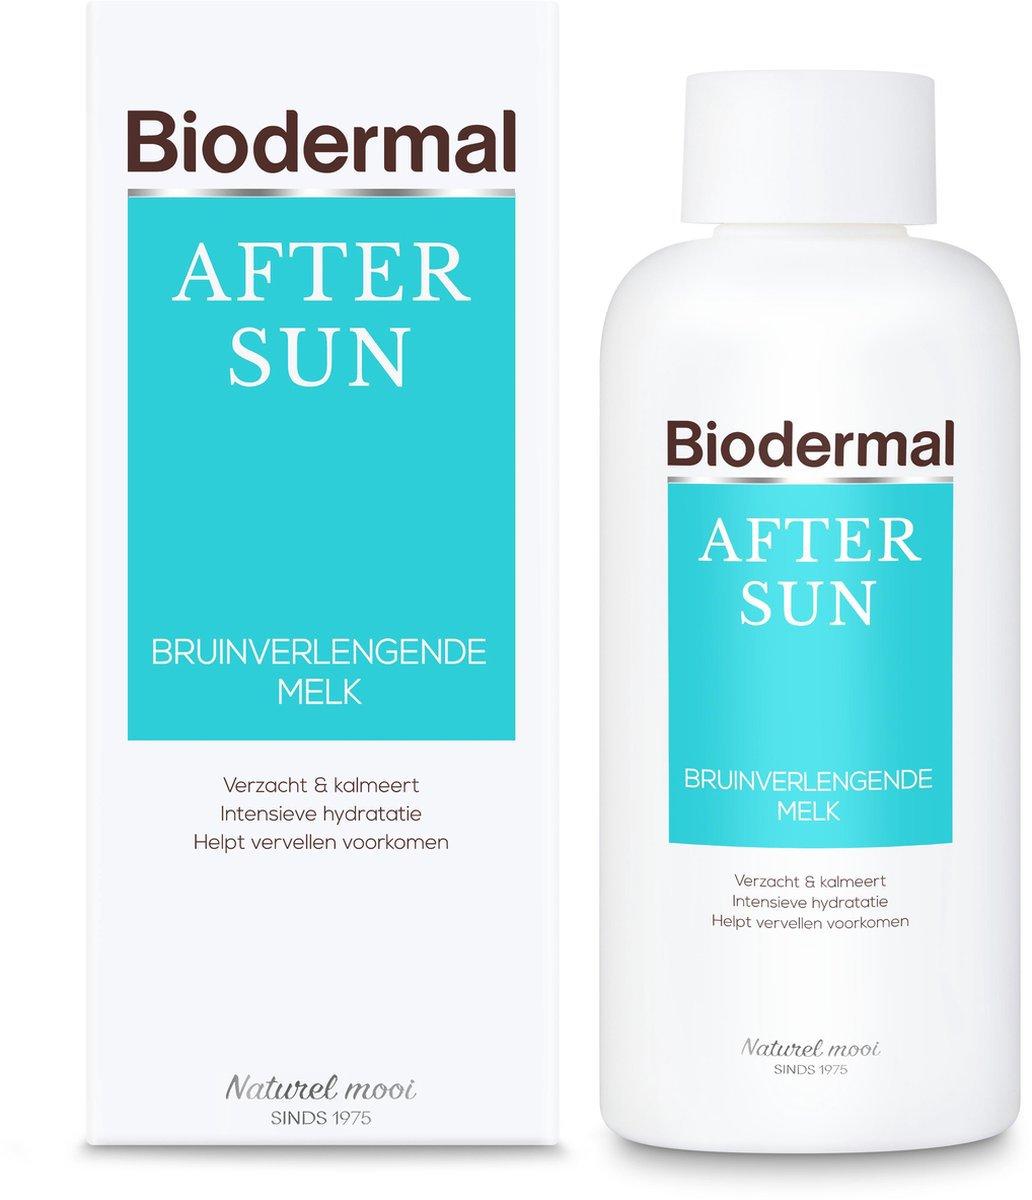 Biodermal Aftersun